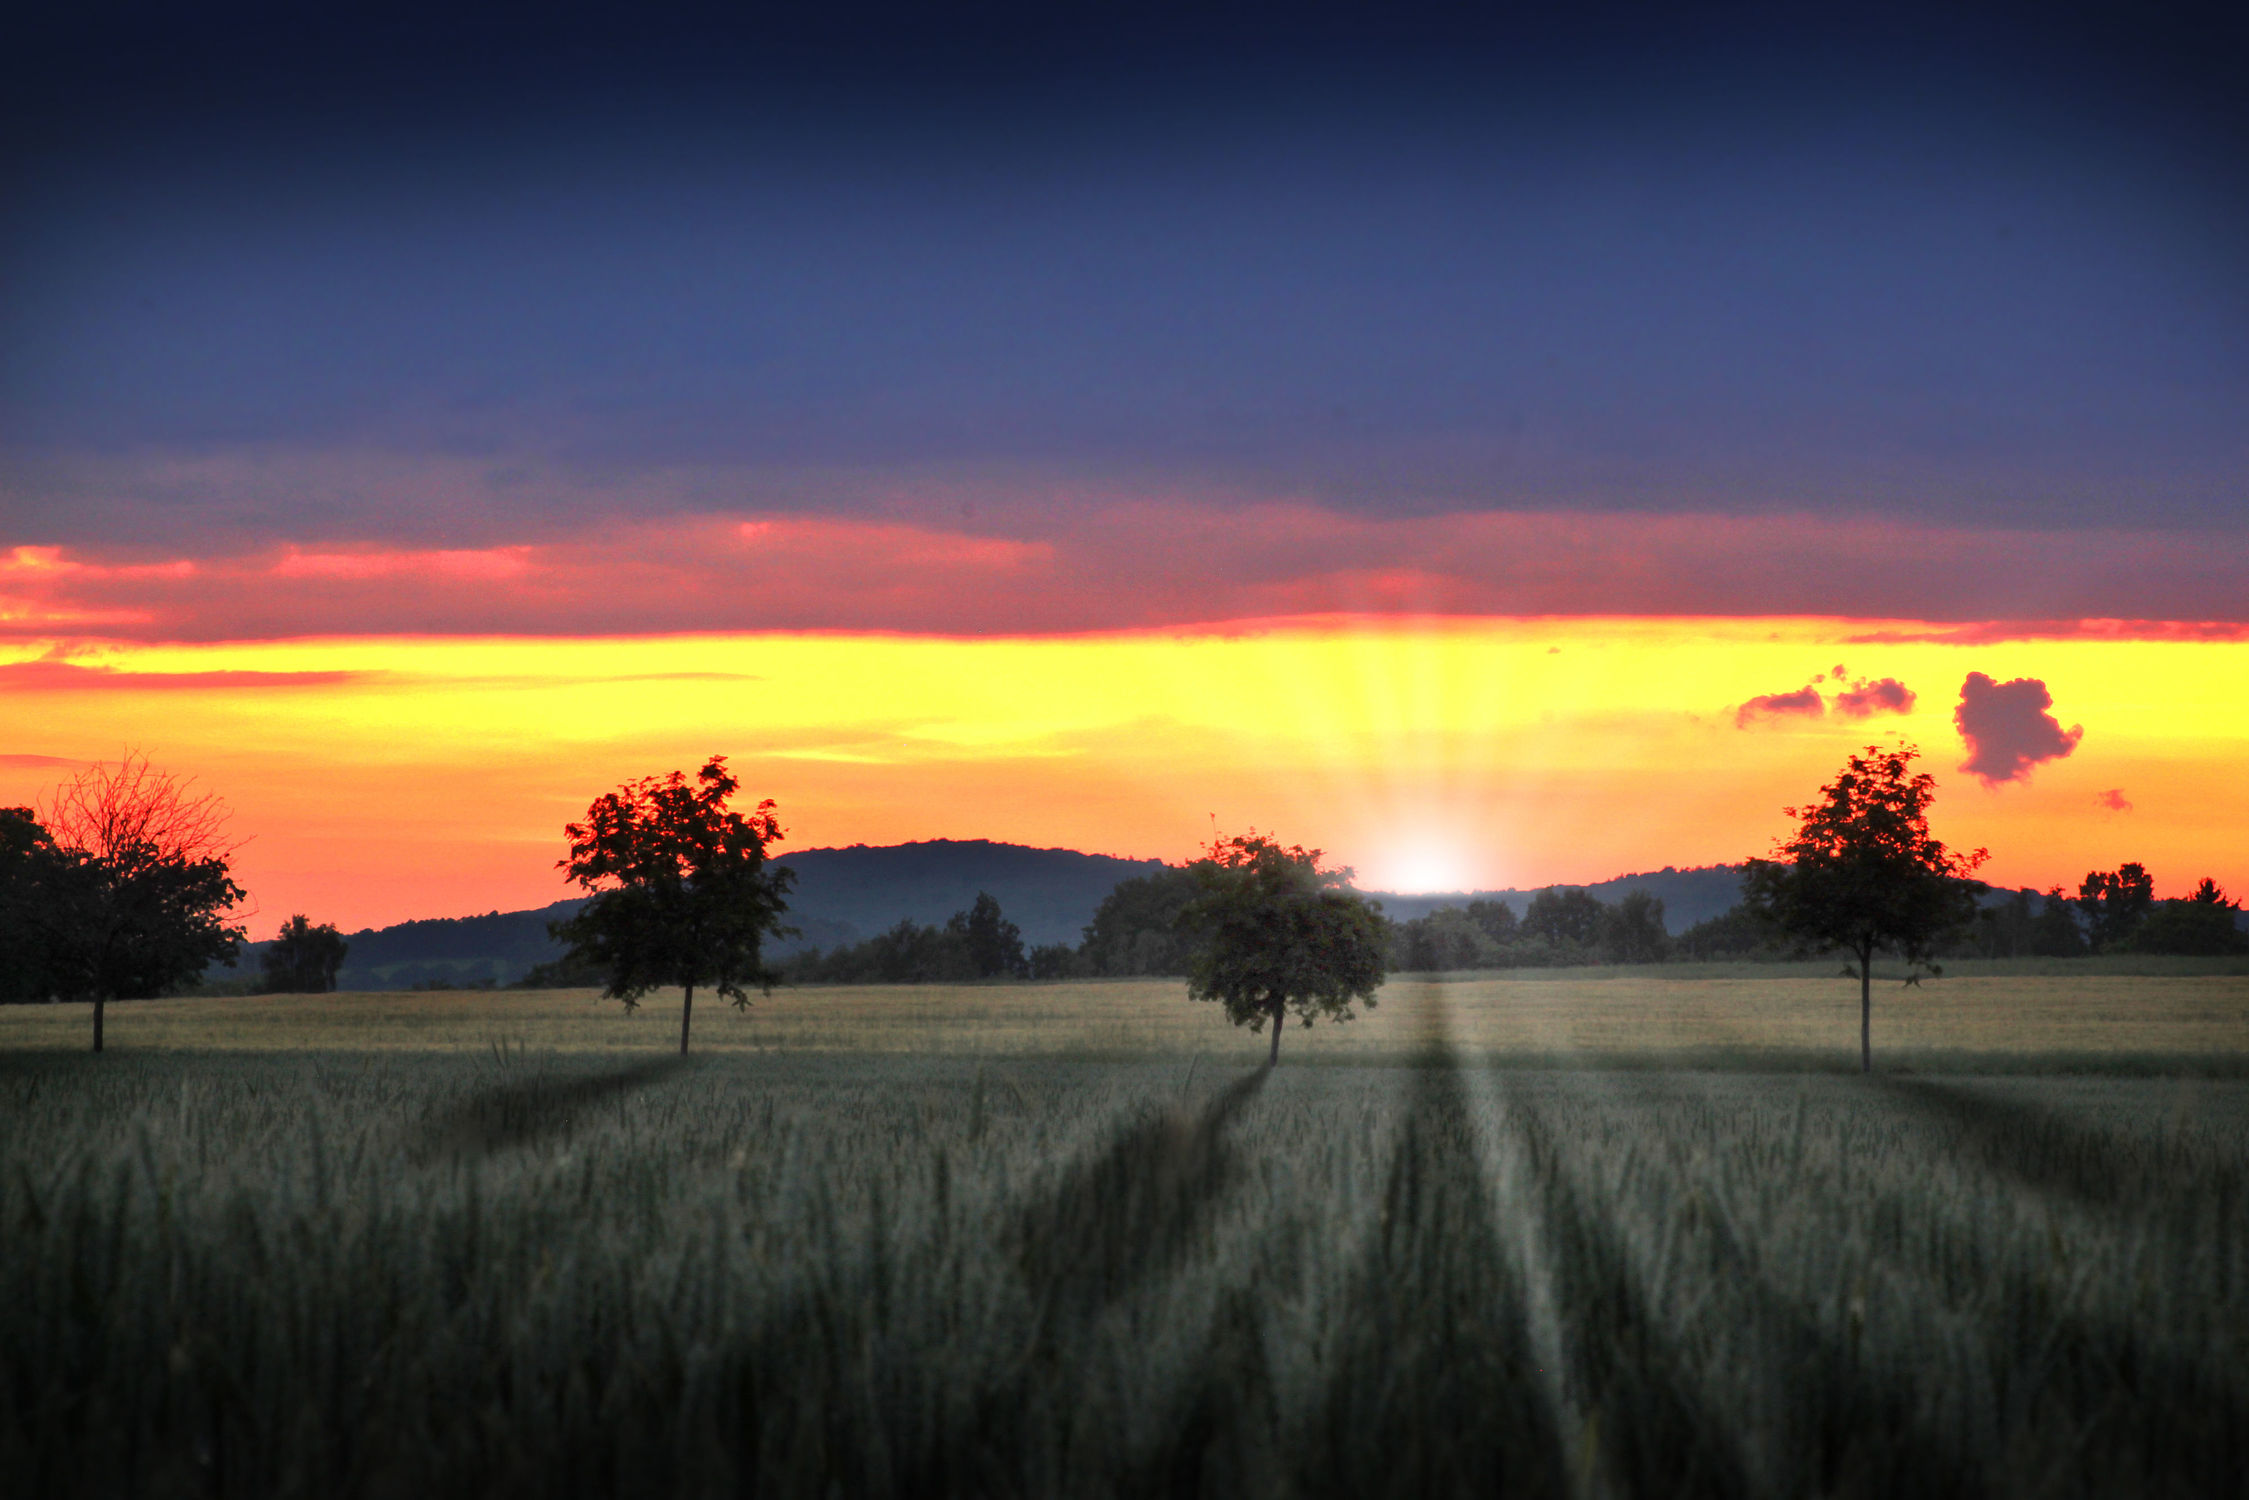 Bild mit Natur, Sonnenuntergang, Sonnenaufgang, Landschaft, Feld, mystisch, Schatten